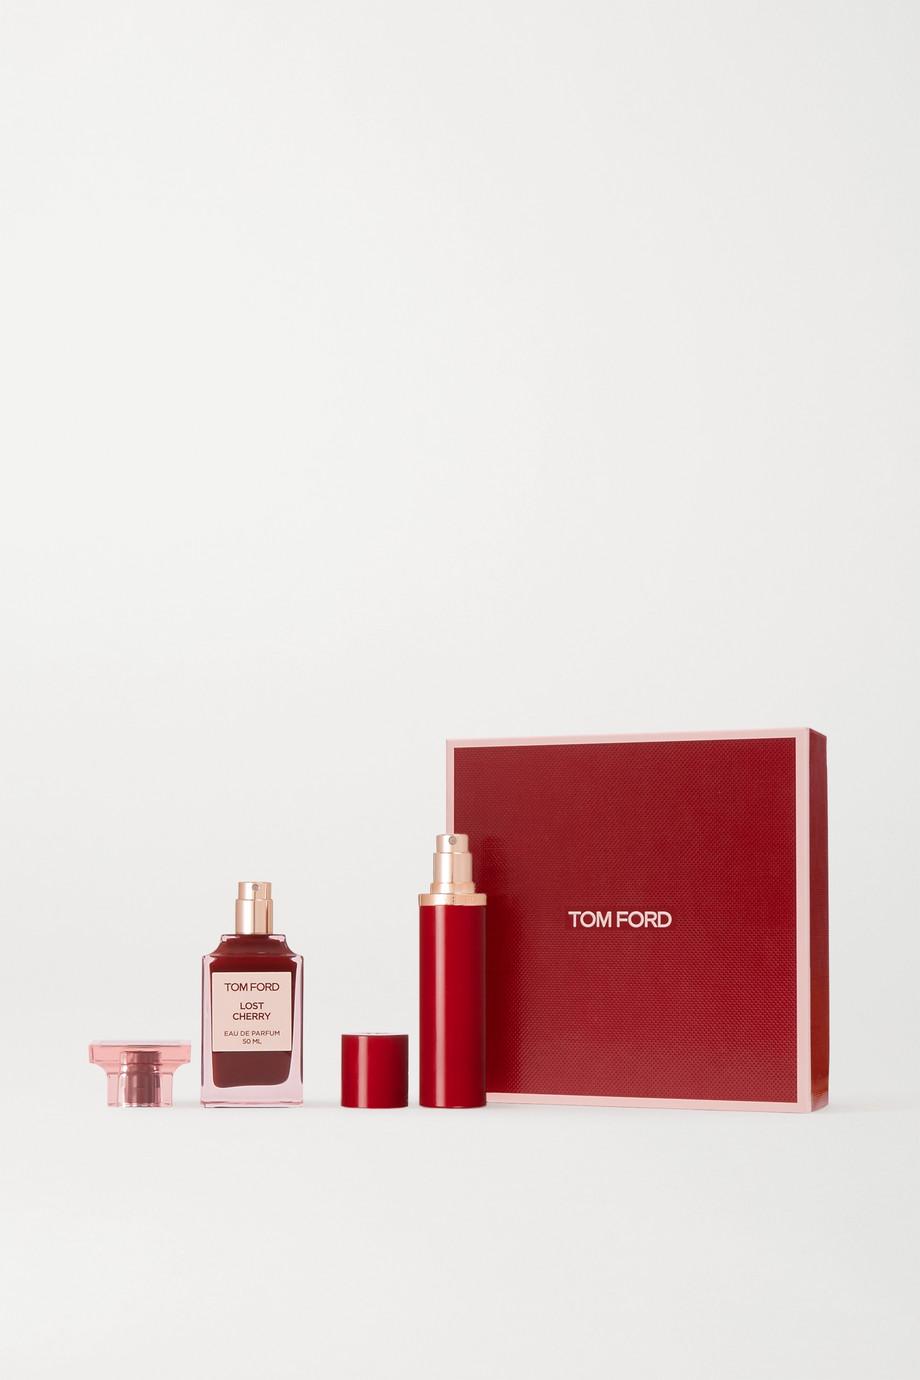 TOM FORD BEAUTY Eau de Parfum Gift Set - Lost Cherry, 50ml & 10ml